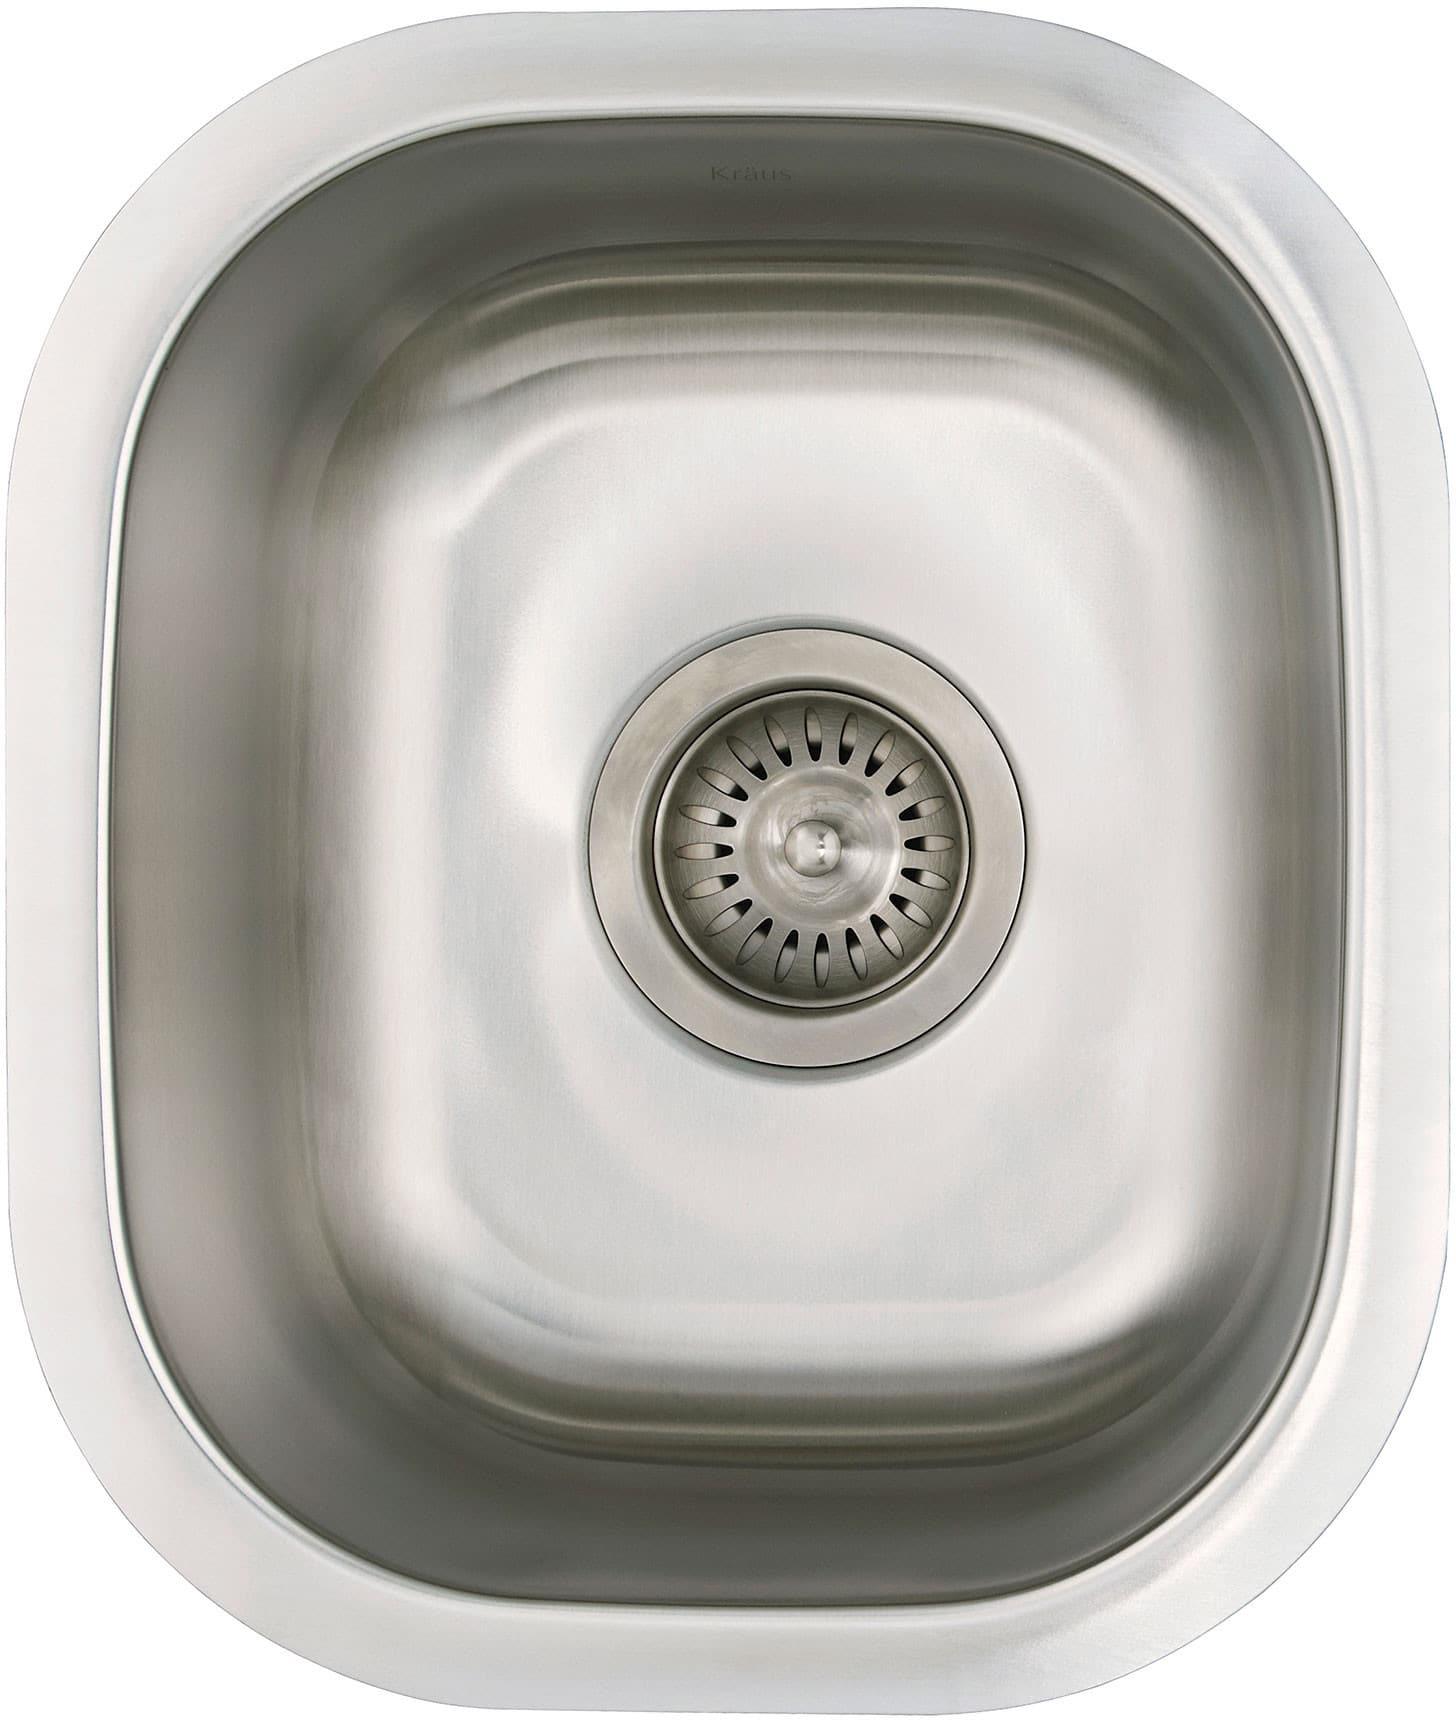 Beau Kraus KBU17B 13 Inch Undercounter Sink With 7 Inch Basin Depth, 18 Gauge,  304 Series Stainless Steel, Sound Dampening Insulation And Satin Finish